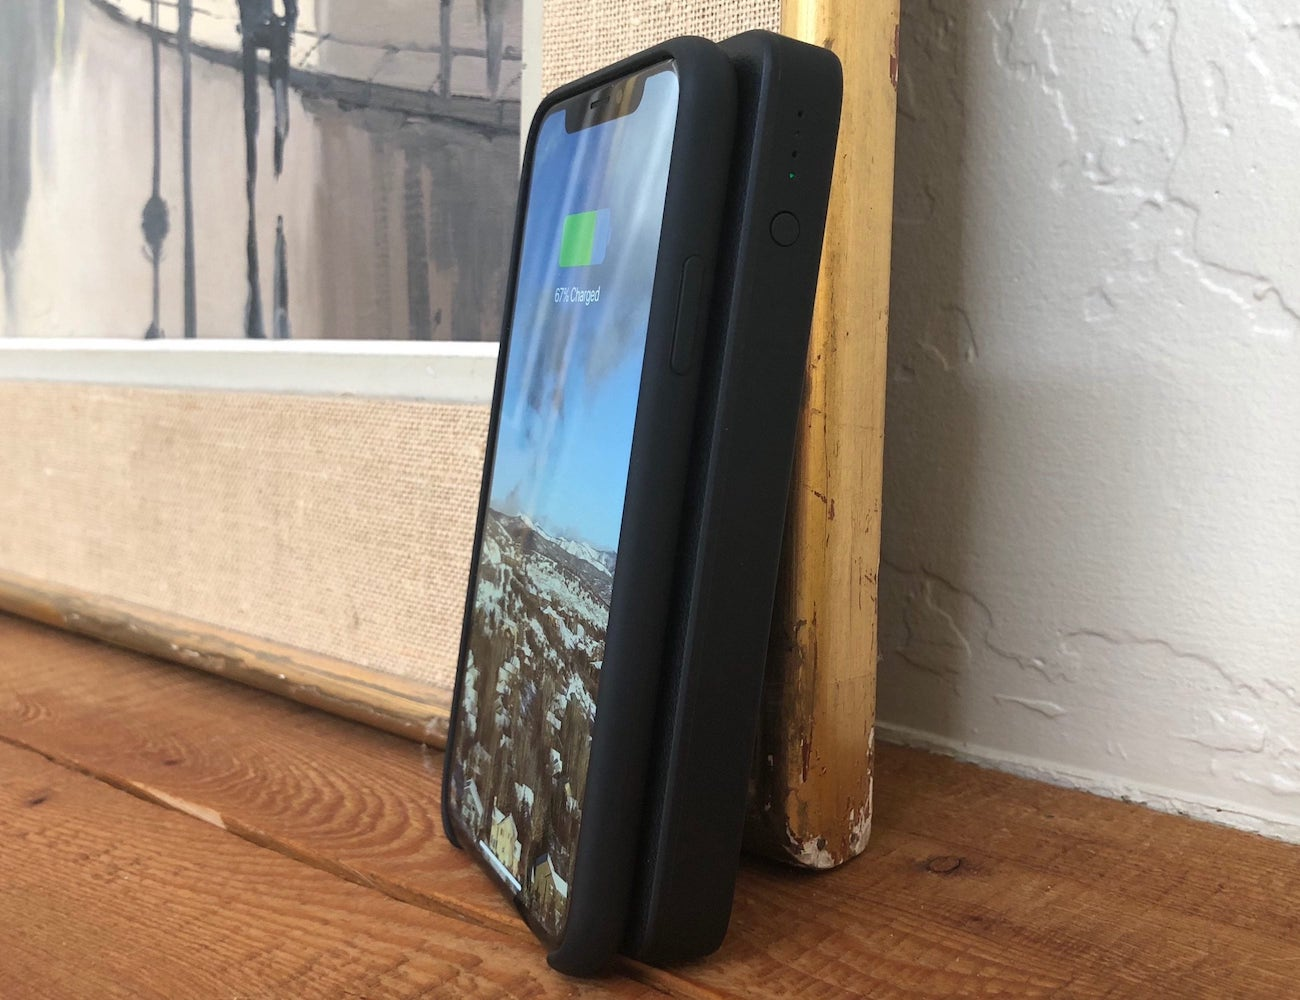 Ugreen Wireless Charging Power Bank